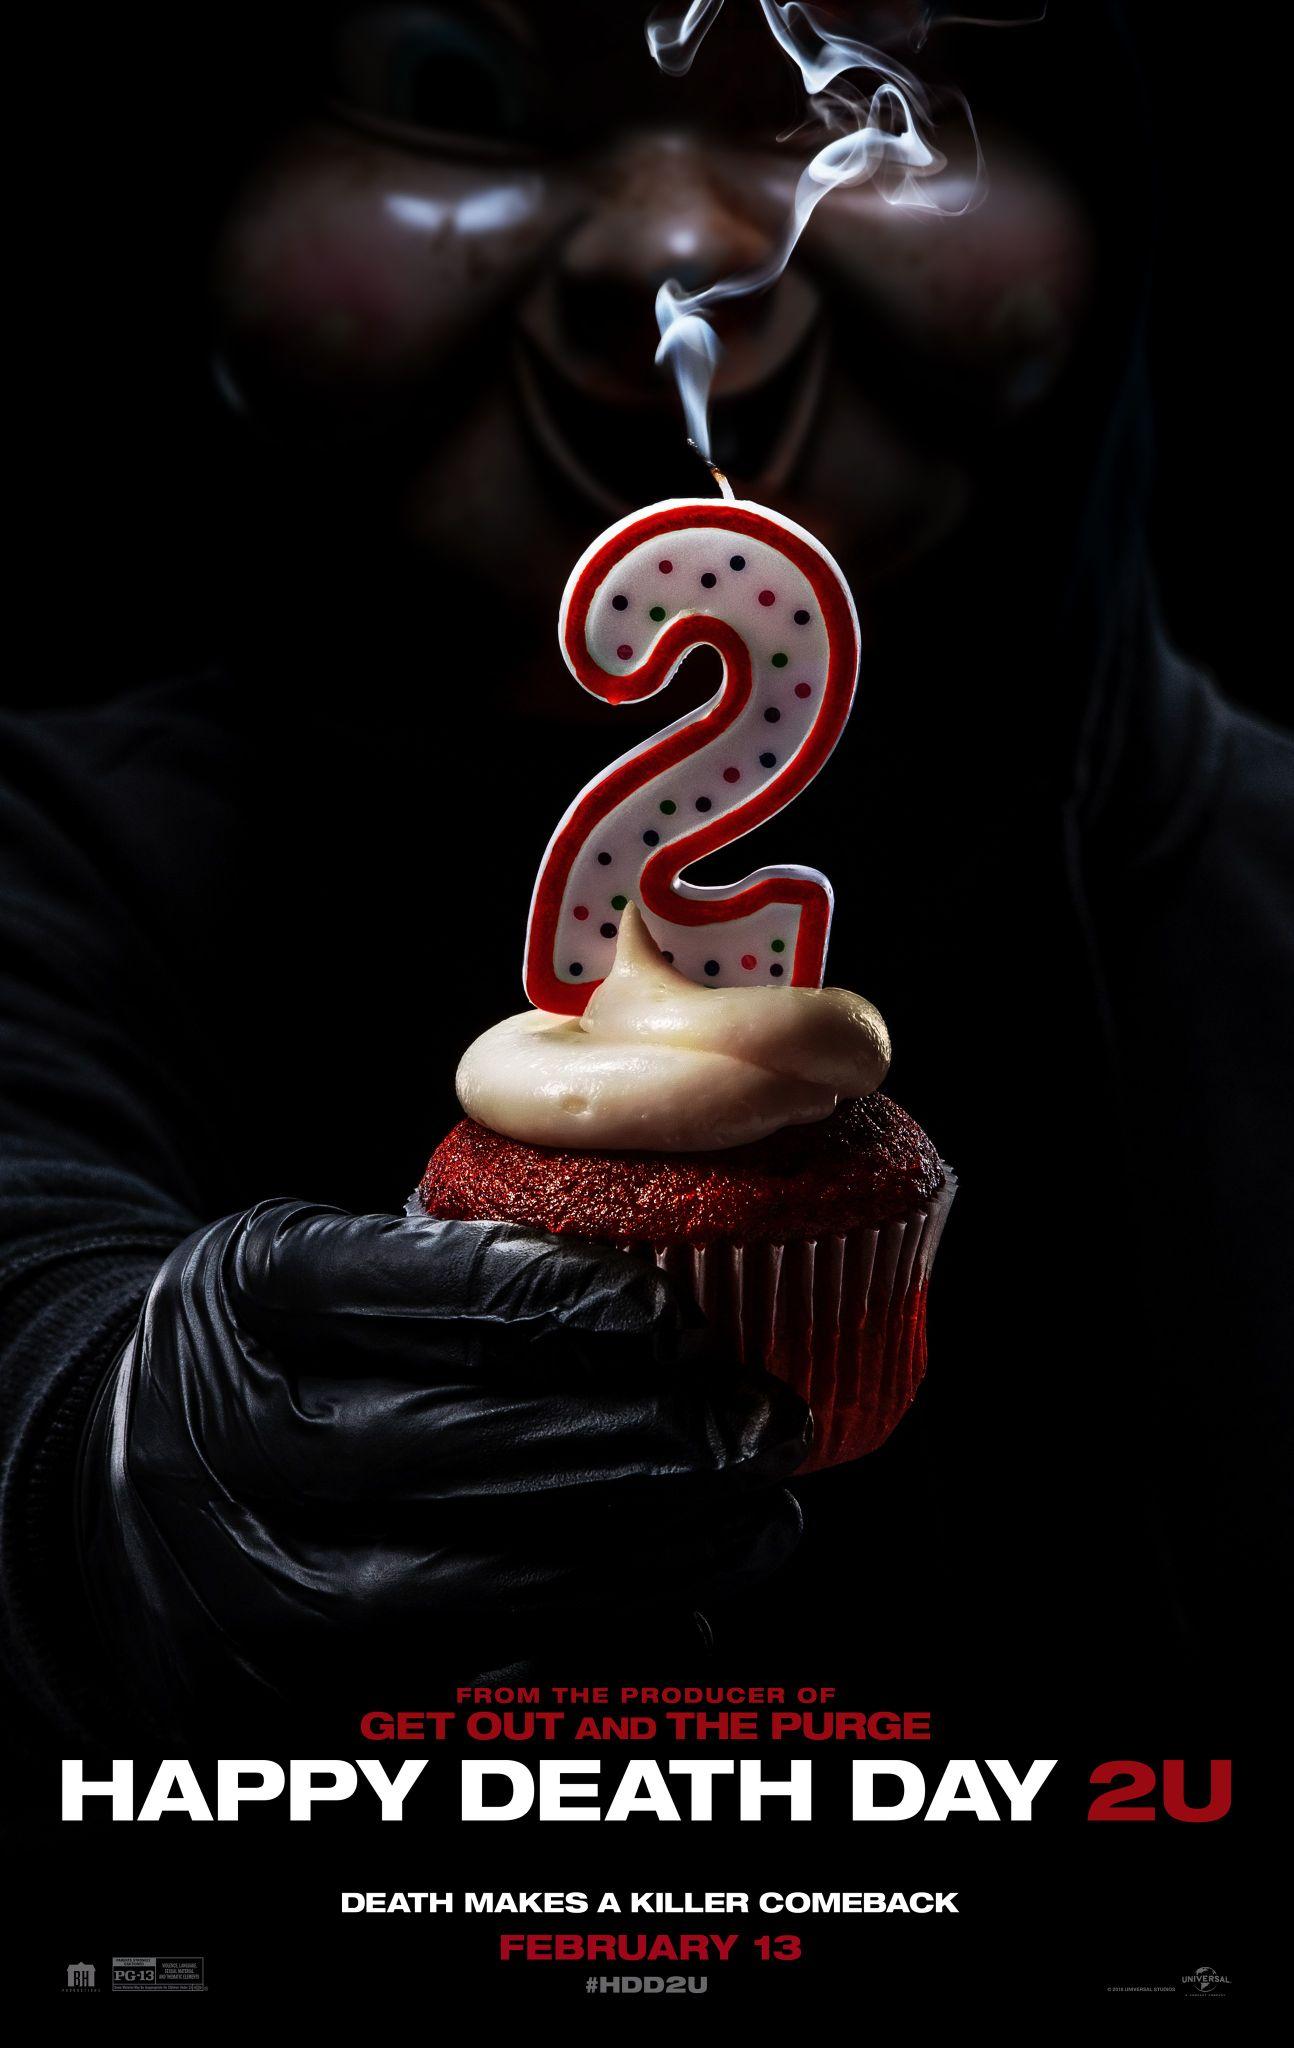 Happy Death Day 2U (4K UHD) to own @ Amazon Prime Video